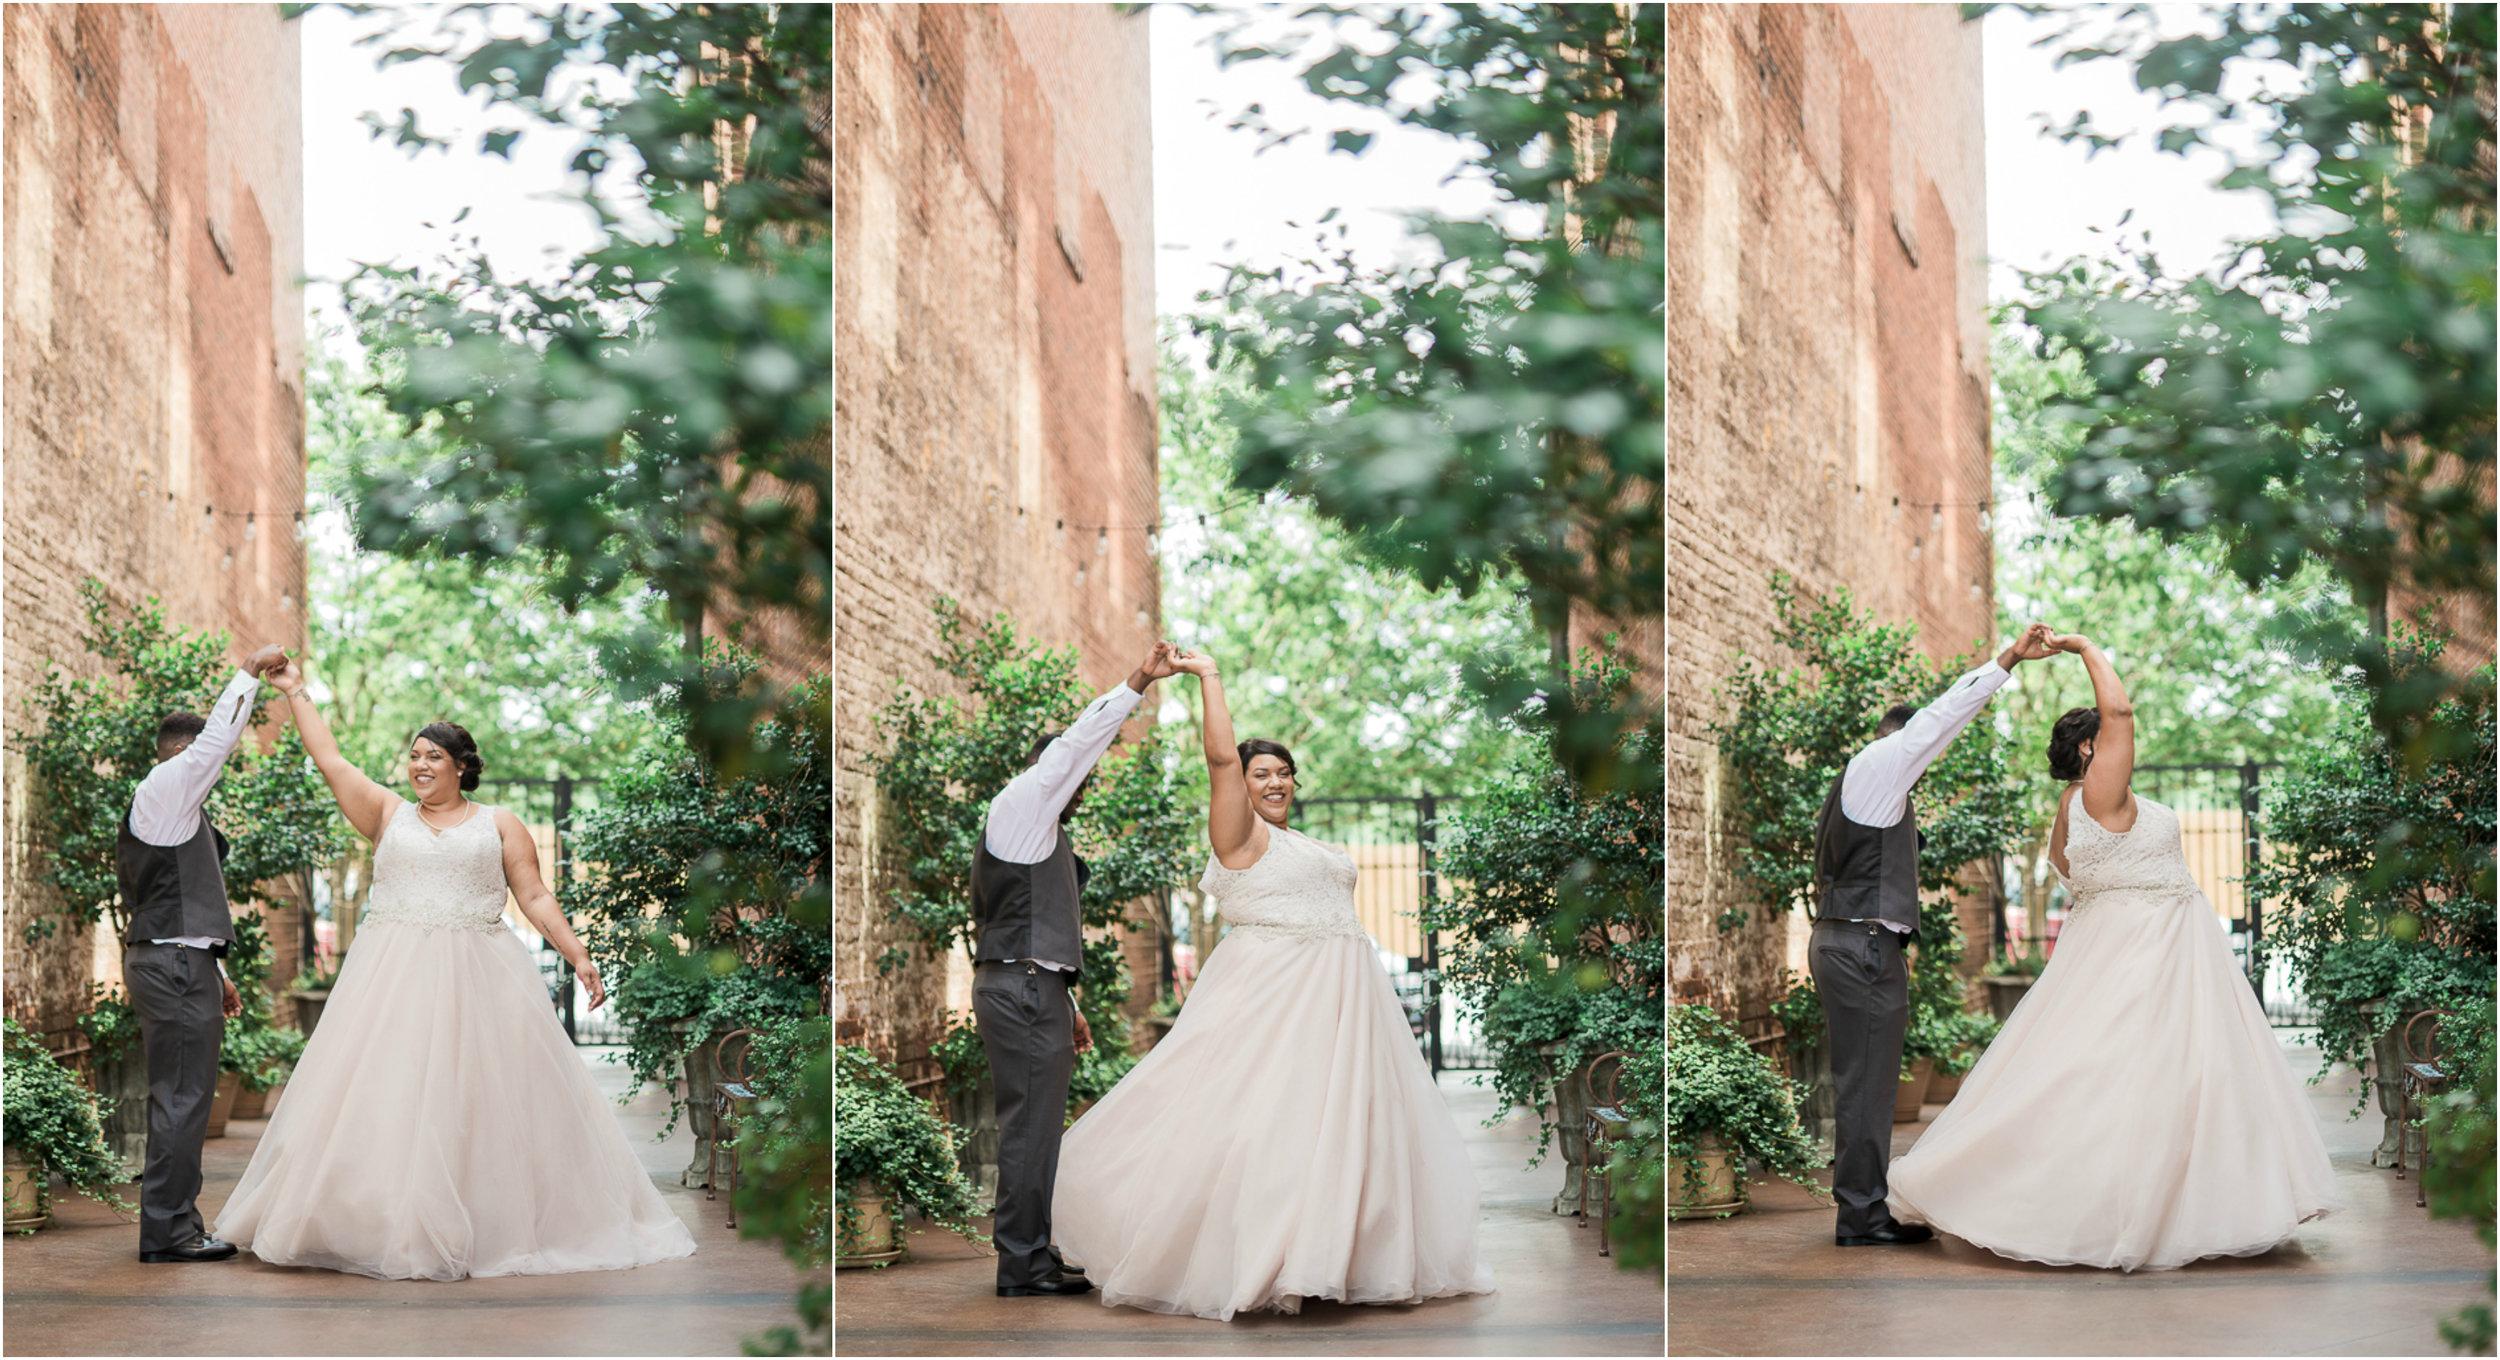 Wedding Portraits, Wedding Dance, Blush Wedding Dress, Bride, Groom, Court Yard, 0004.jpg